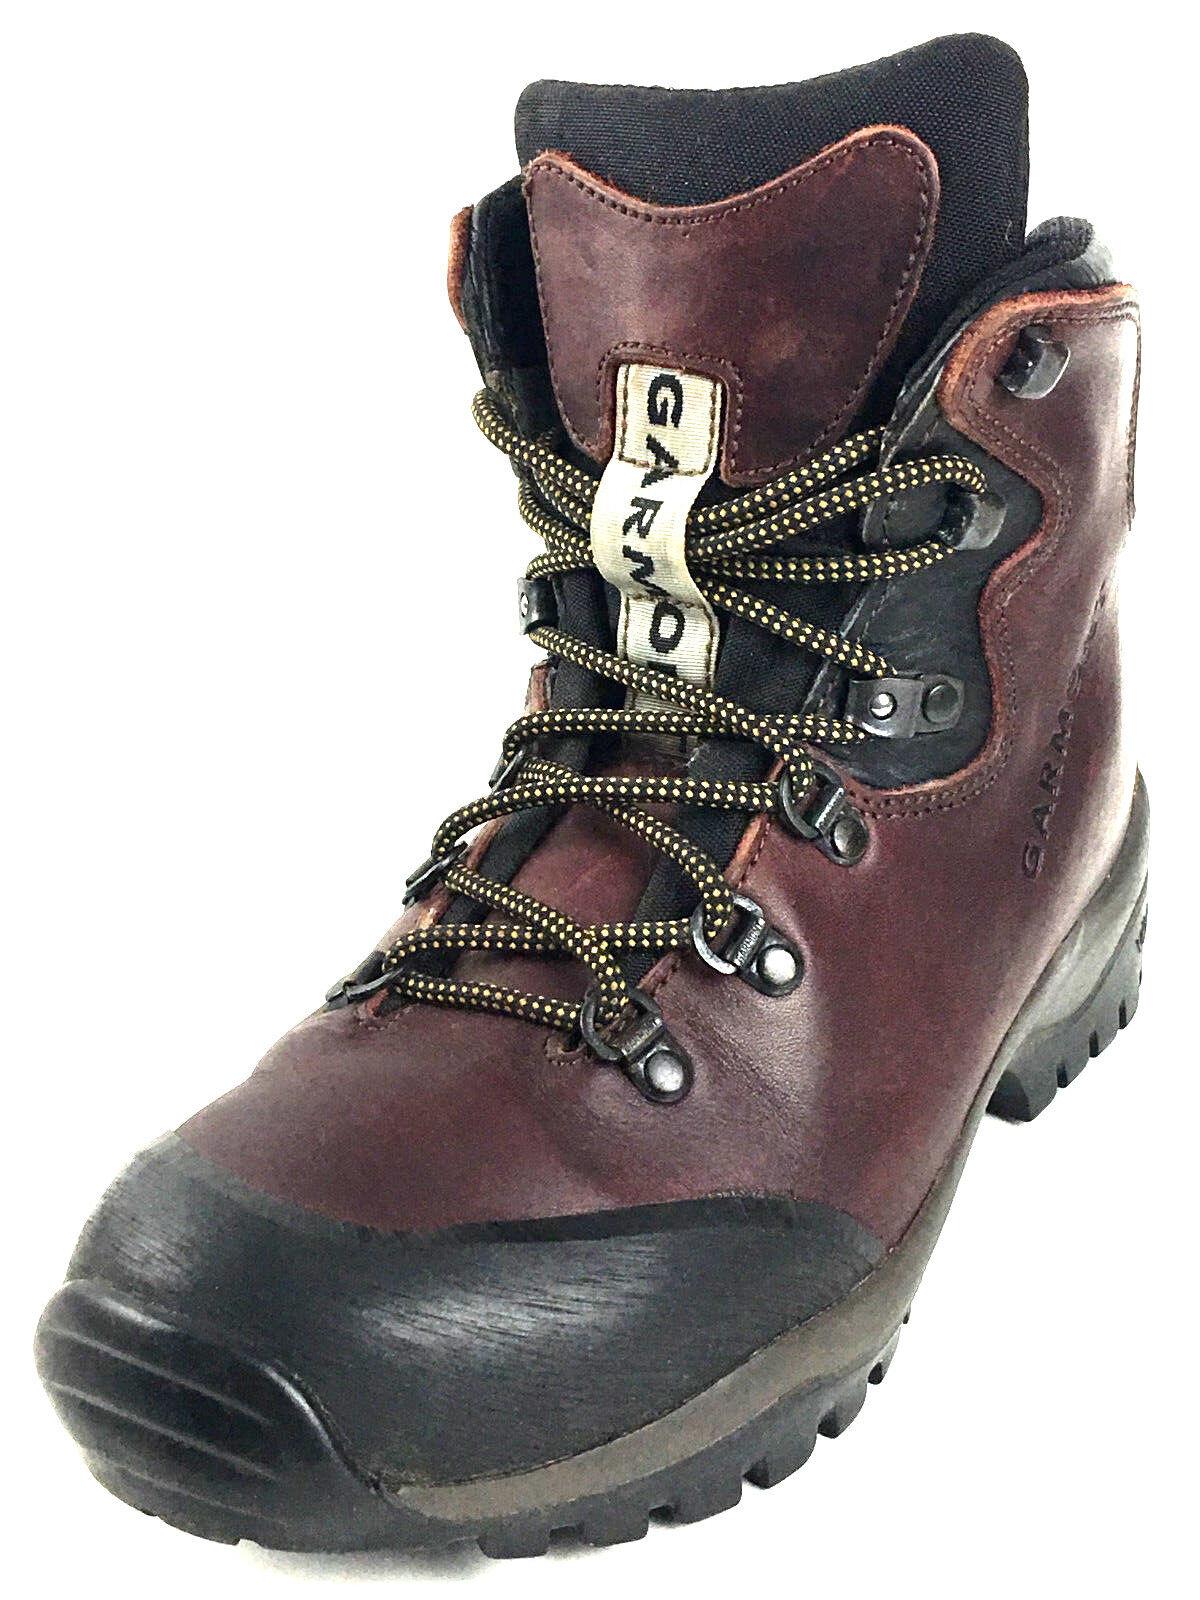 Garmont Hiking Alpine Boots Italy Wmns. US.7.5 -8 UK.6 EU.39.5 Men US.7-7.5